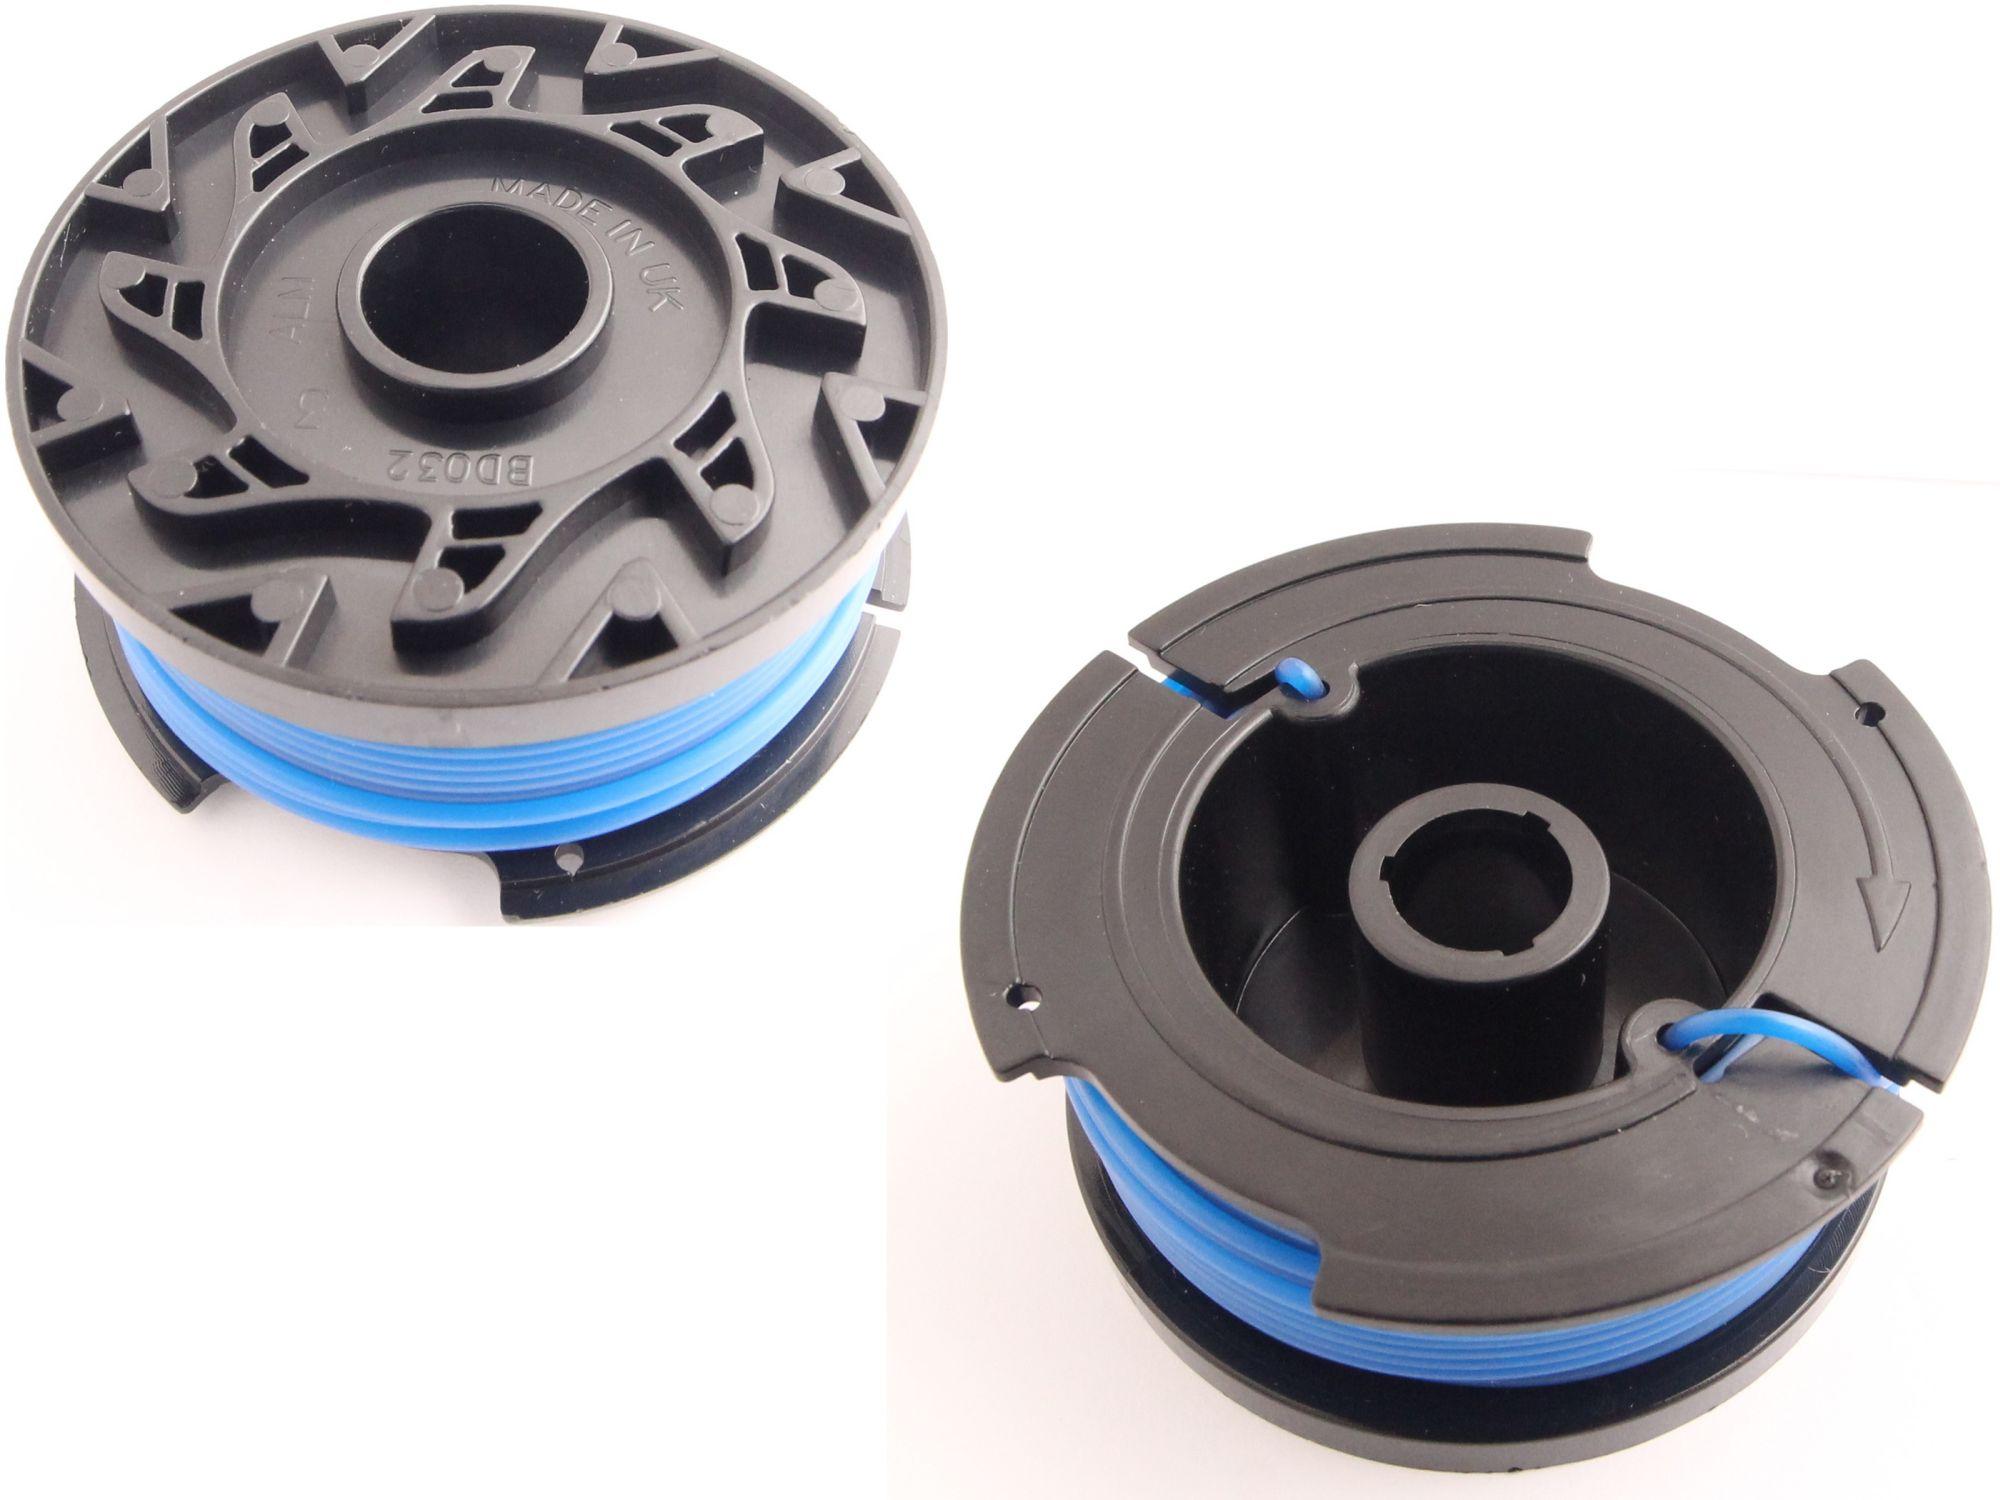 fadenspule 1 6mm passend black decker stc1820pst rasentrimmer trimmer rasentraktoren motoren. Black Bedroom Furniture Sets. Home Design Ideas